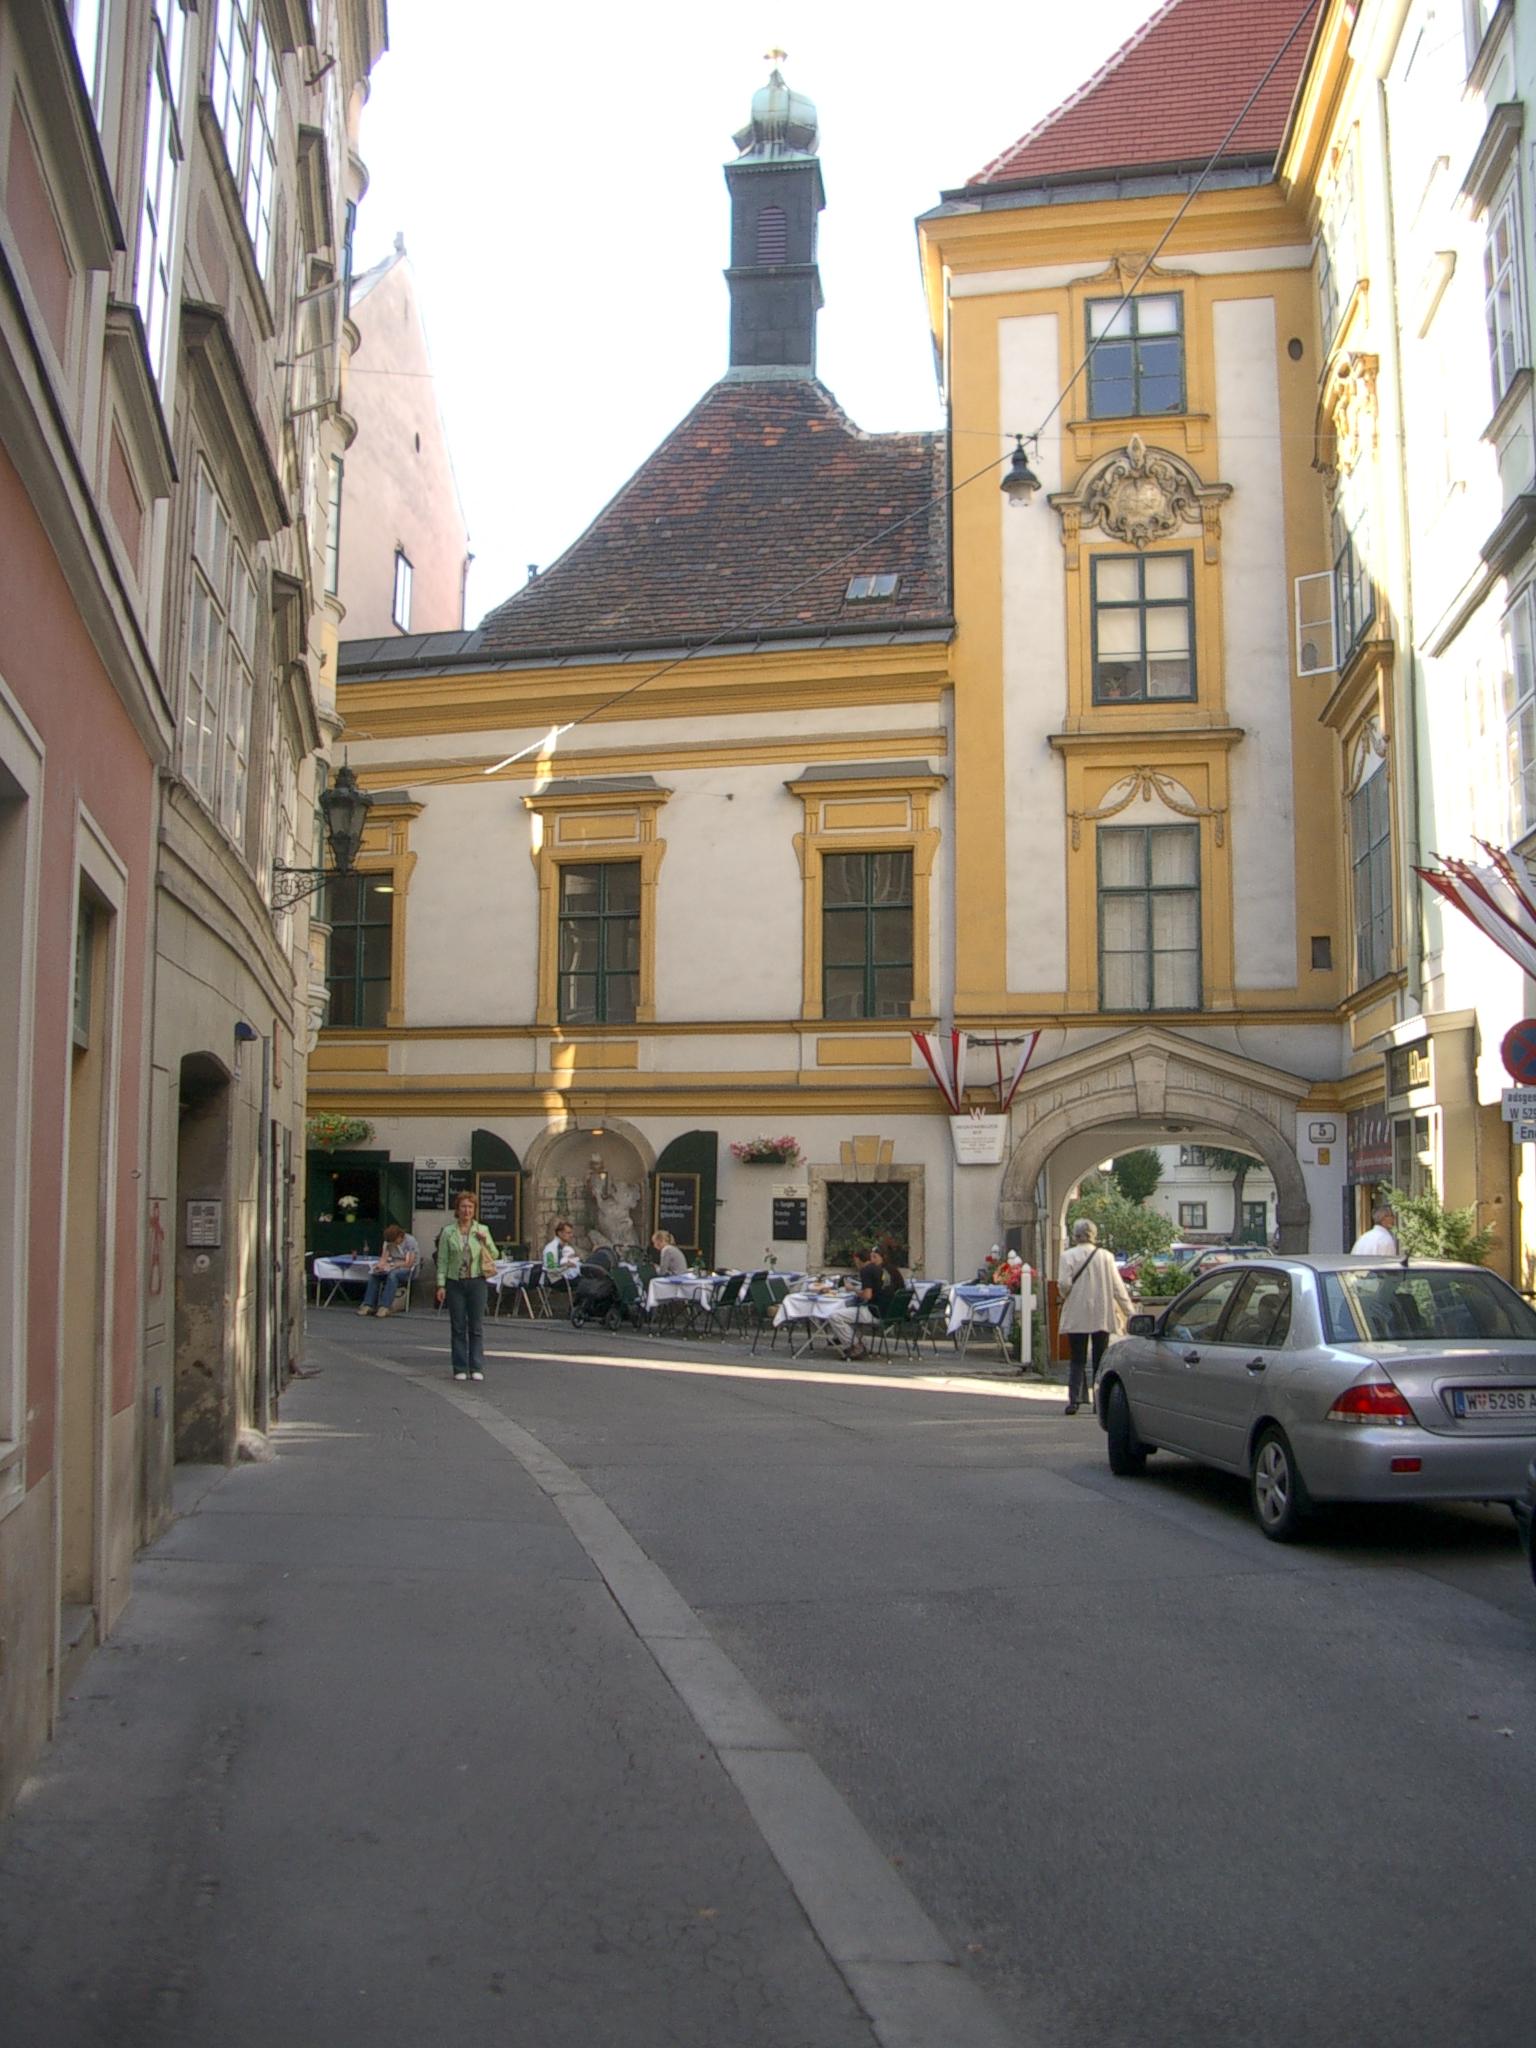 Может здесь и не Таллин, а скорее Вильнюс, но все равно Вена прекрасна и уютна.